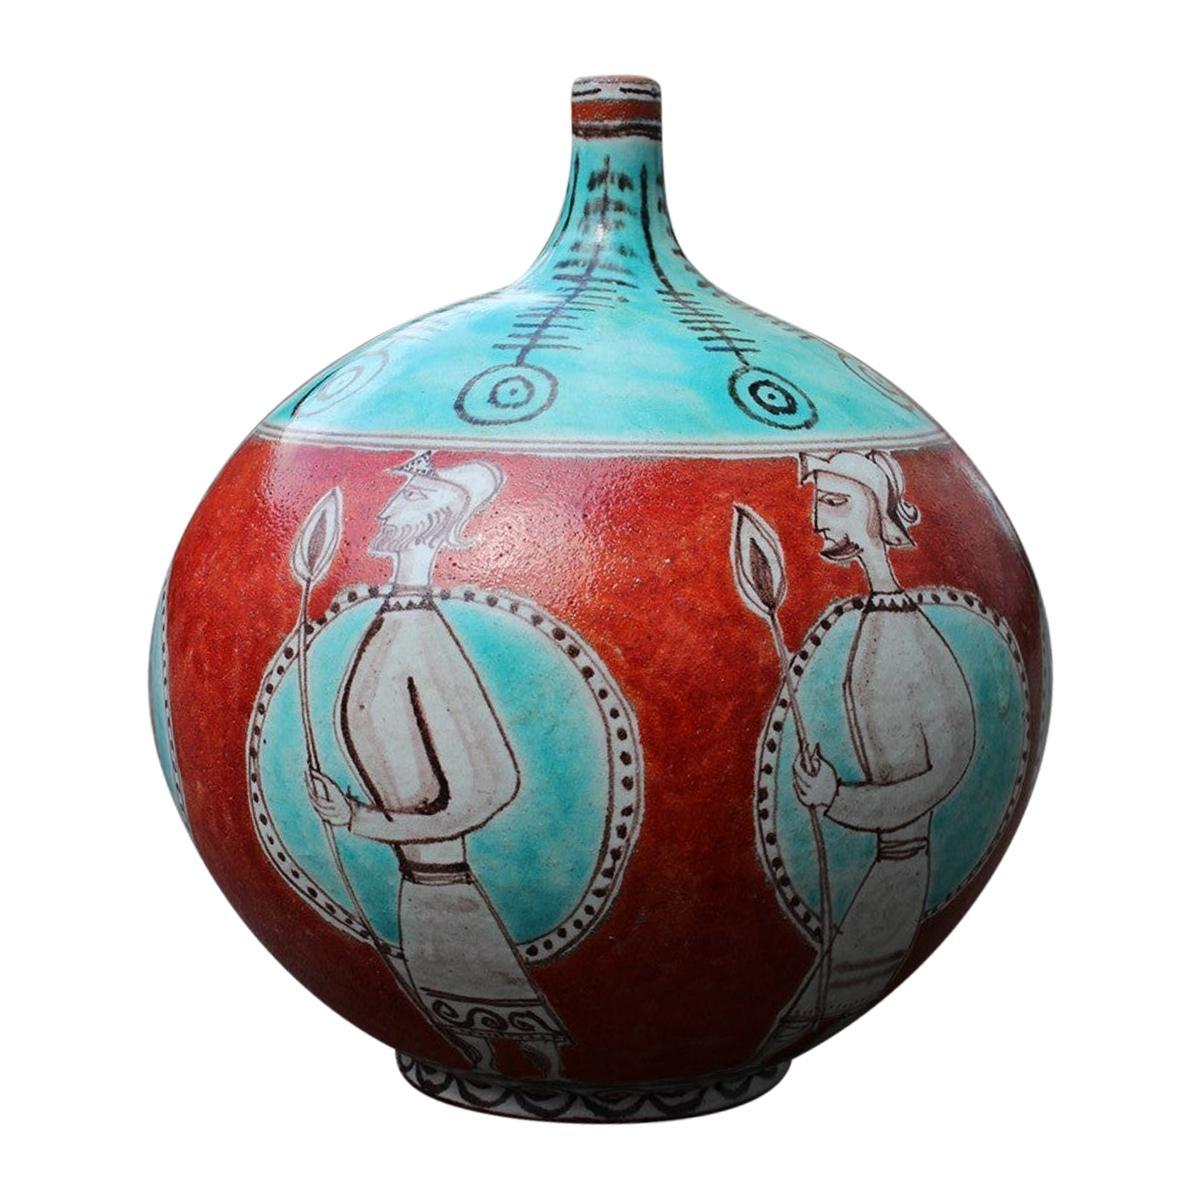 Large Orange Giovanni de Simone 1960 Vase with Picasso Style Warriors